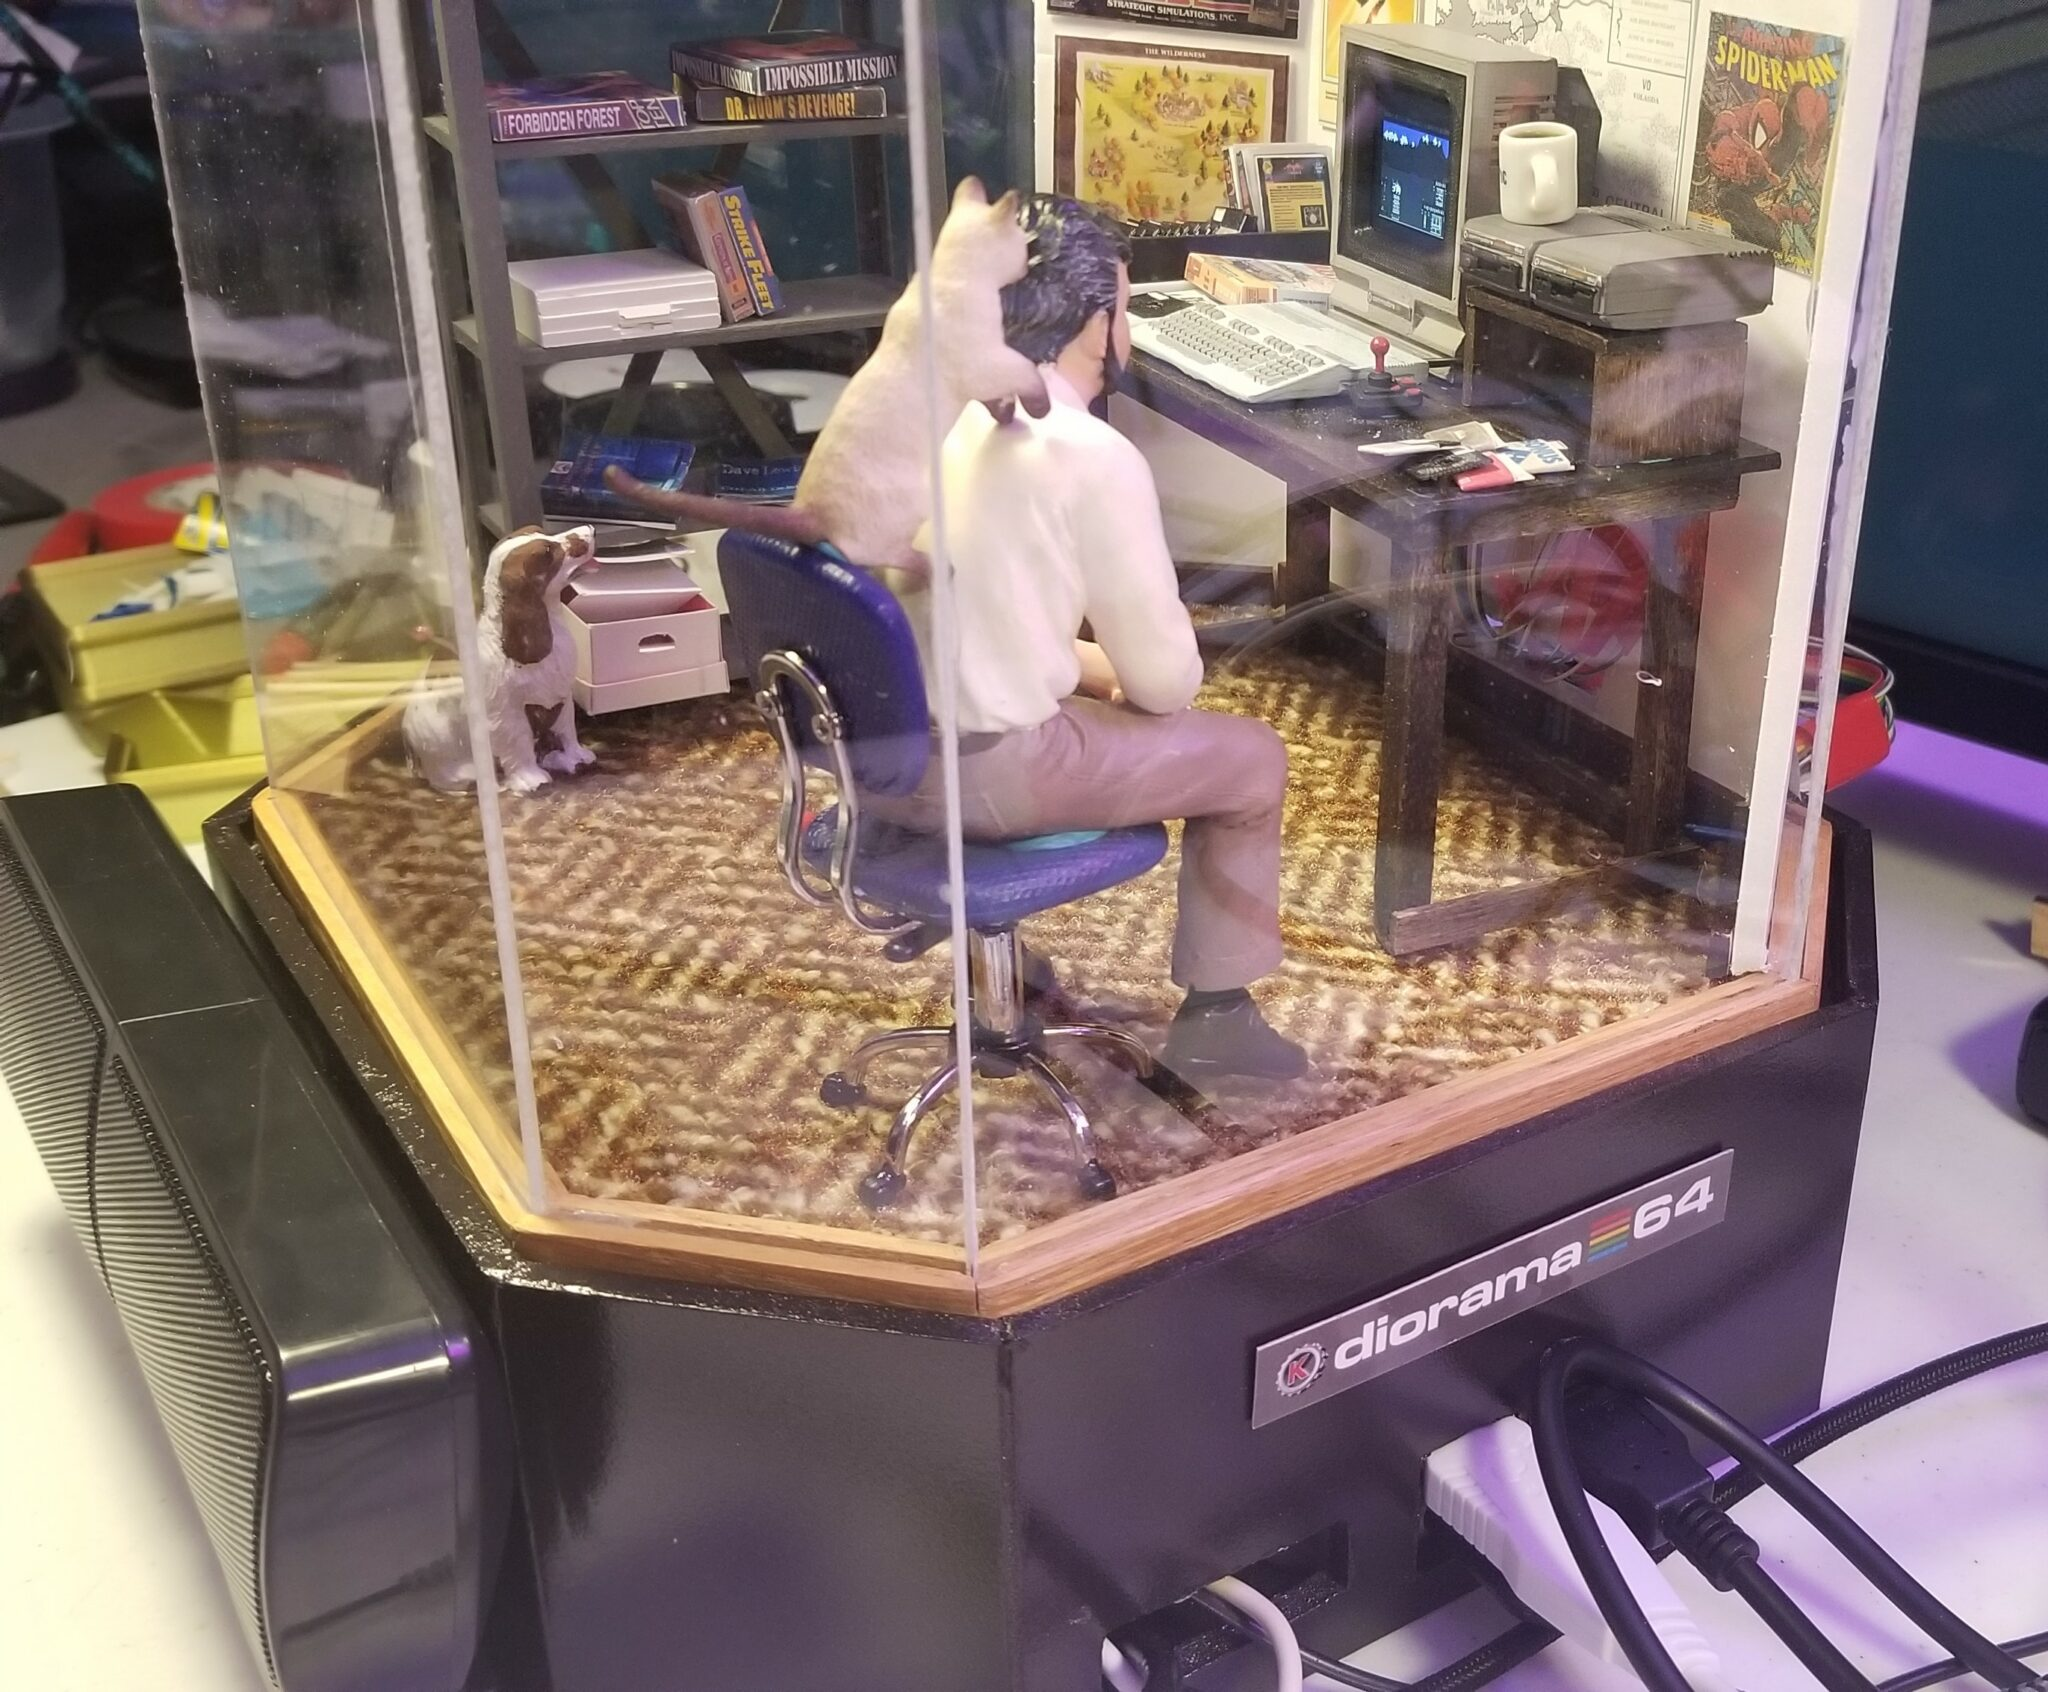 diorama-64-whole-view-scaled.jpg